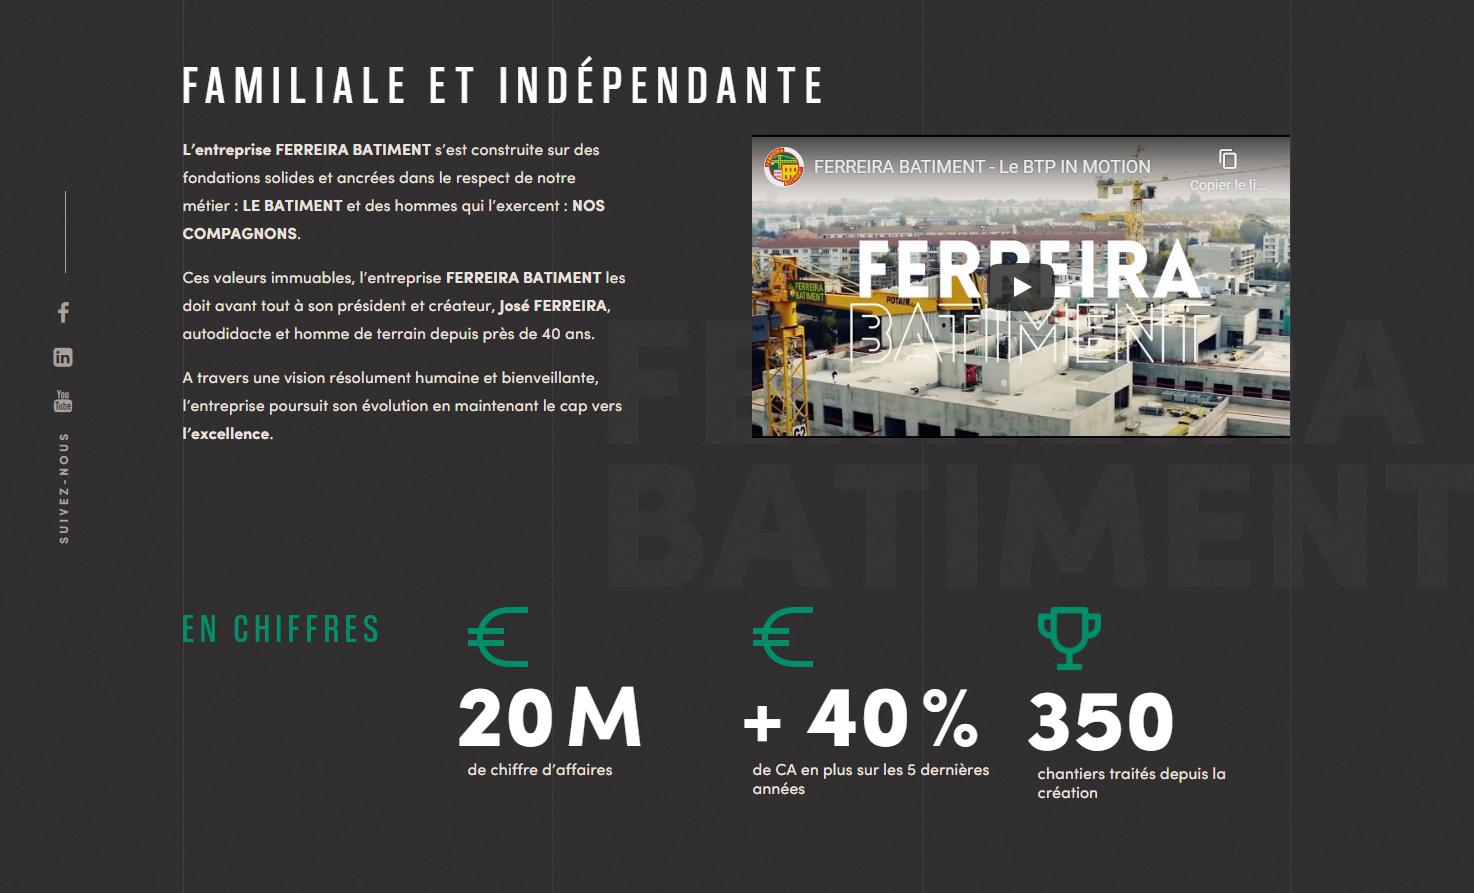 Typographie et iconographie du site Ferreira Bâtiment